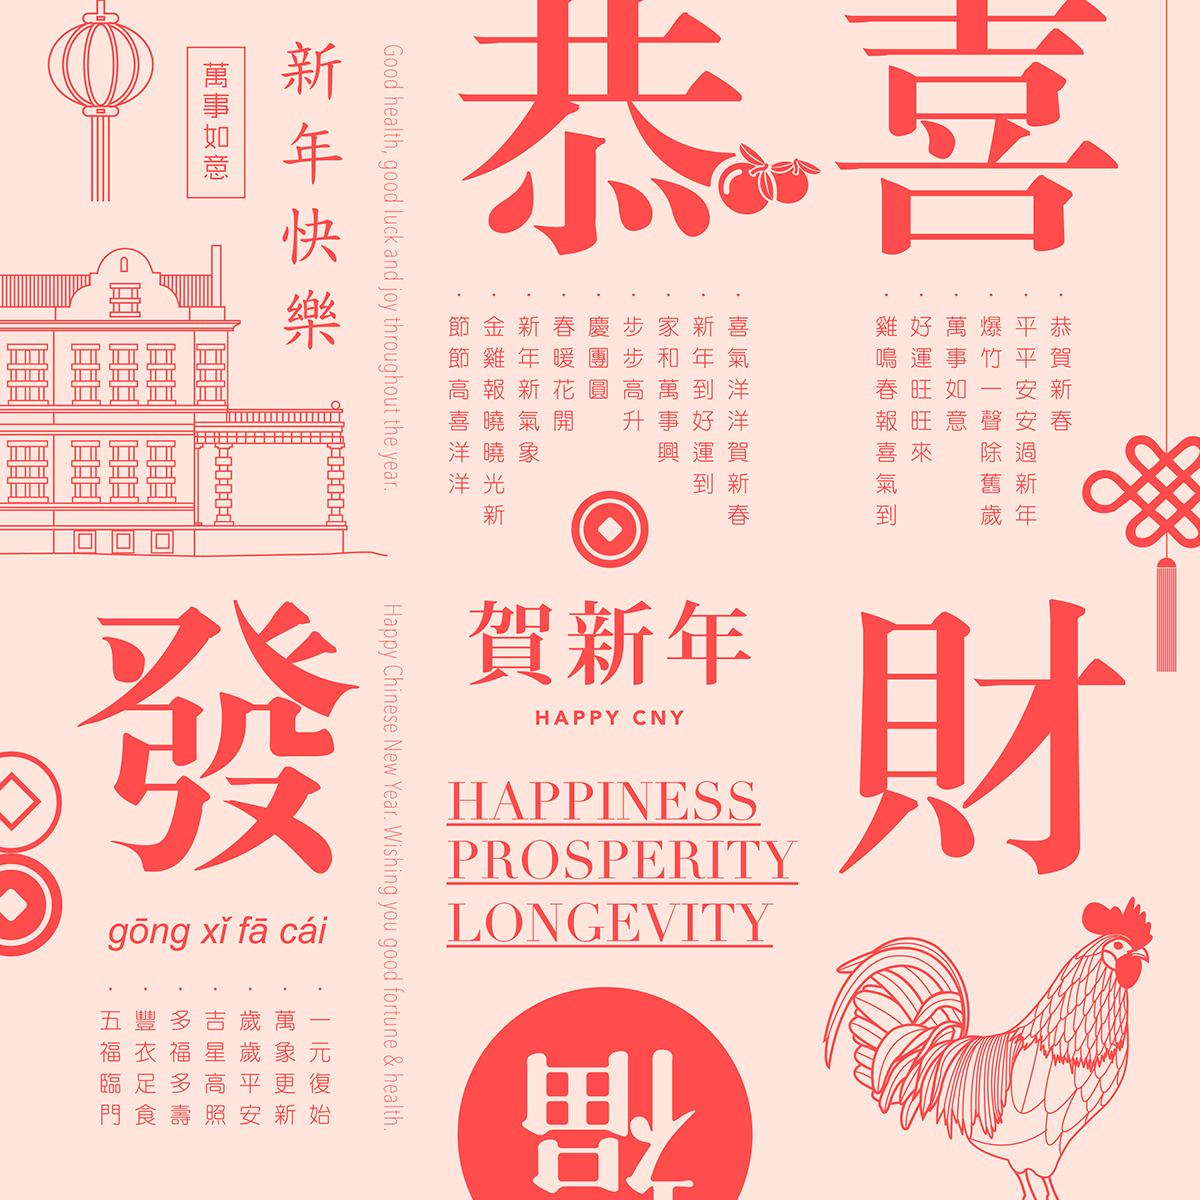 Cny Greeting Card Design 2017 On Behance